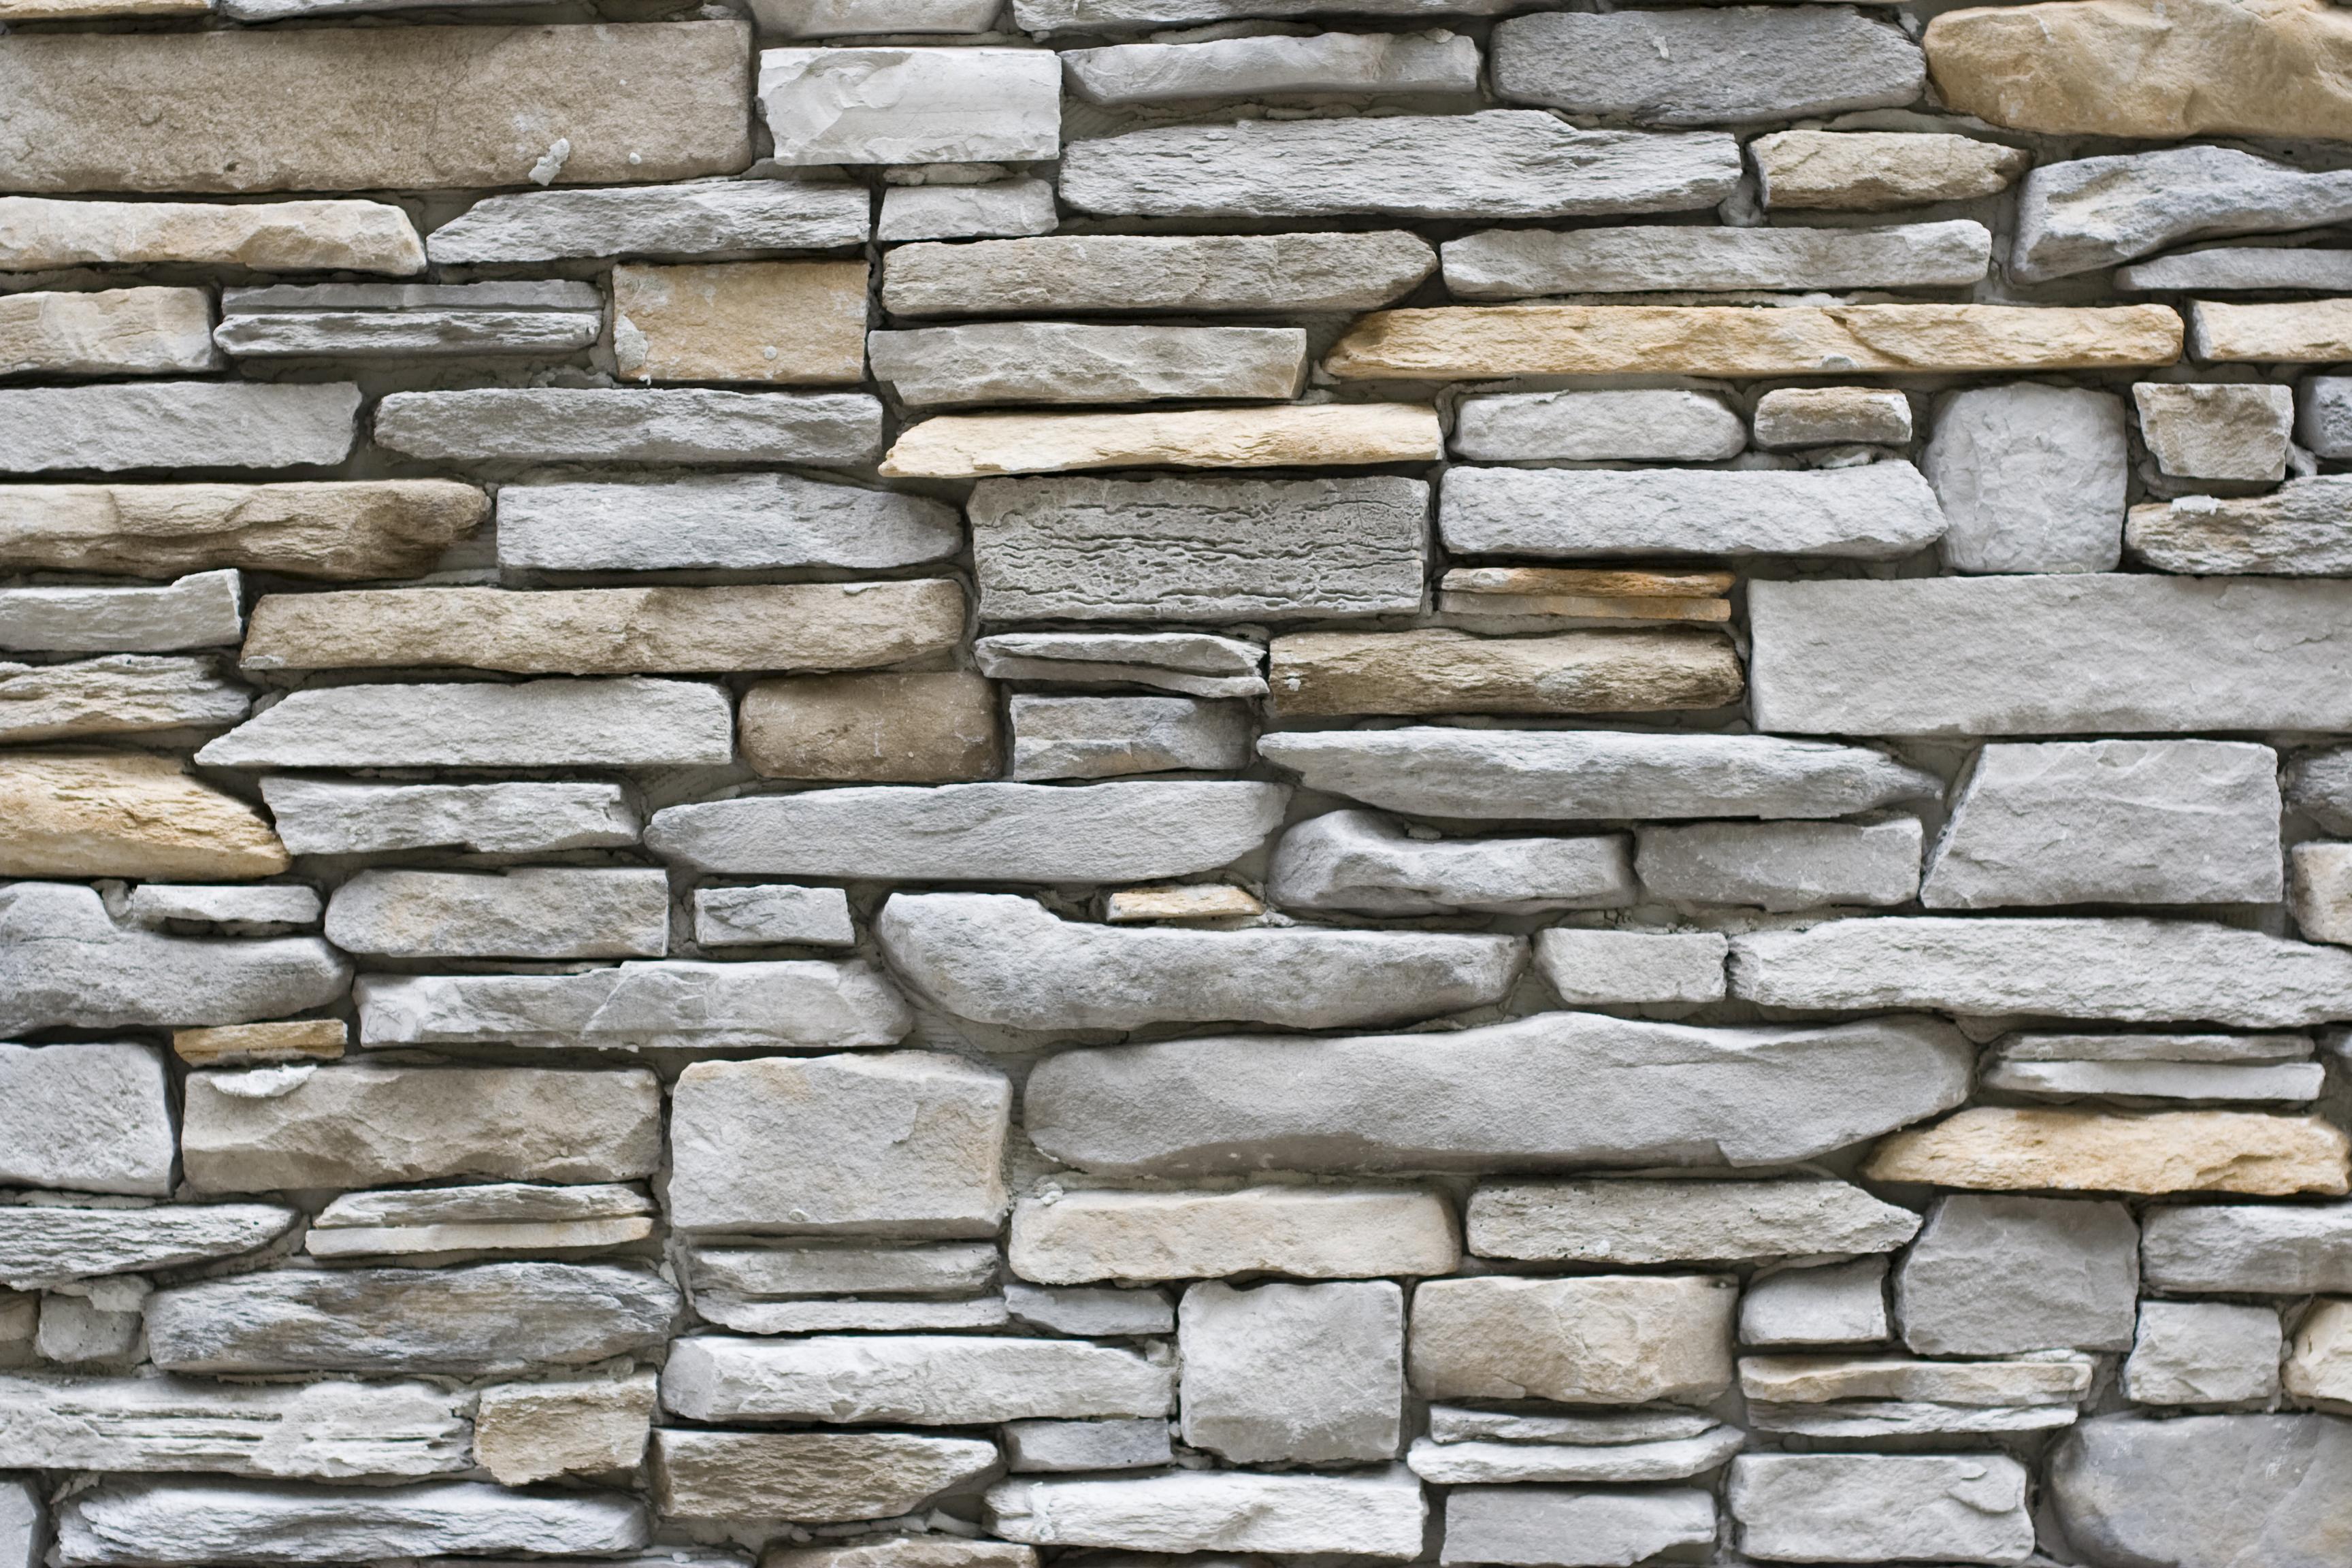 Textura pedras 270cm x 260cm painel fotografico elo7 for Brick stone siding